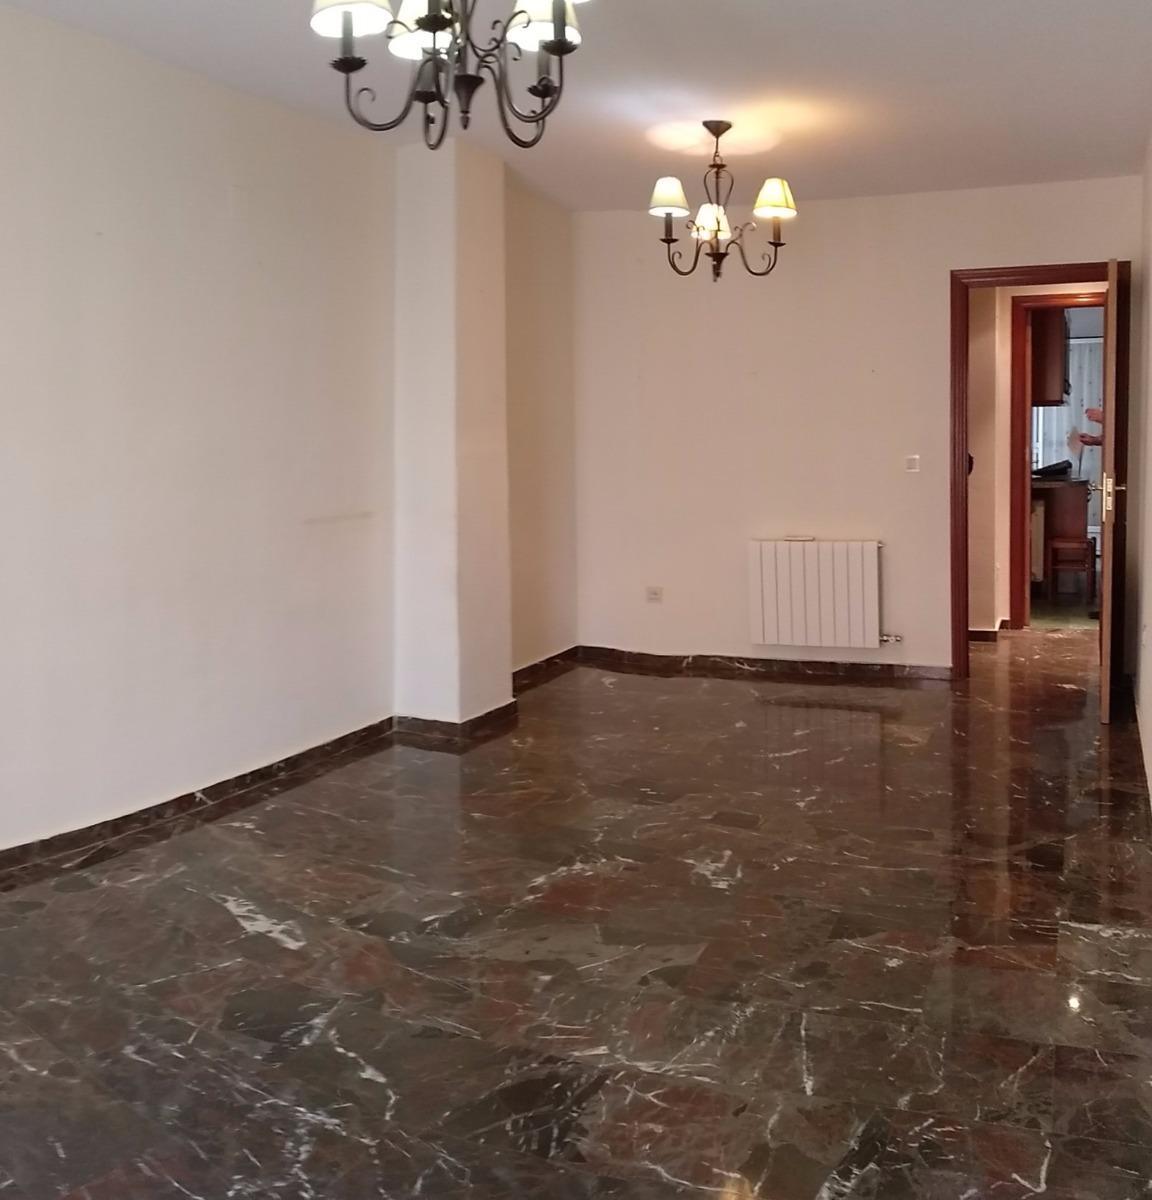 Apartamento, Bulevar, Venta - Jaén (Jaén)